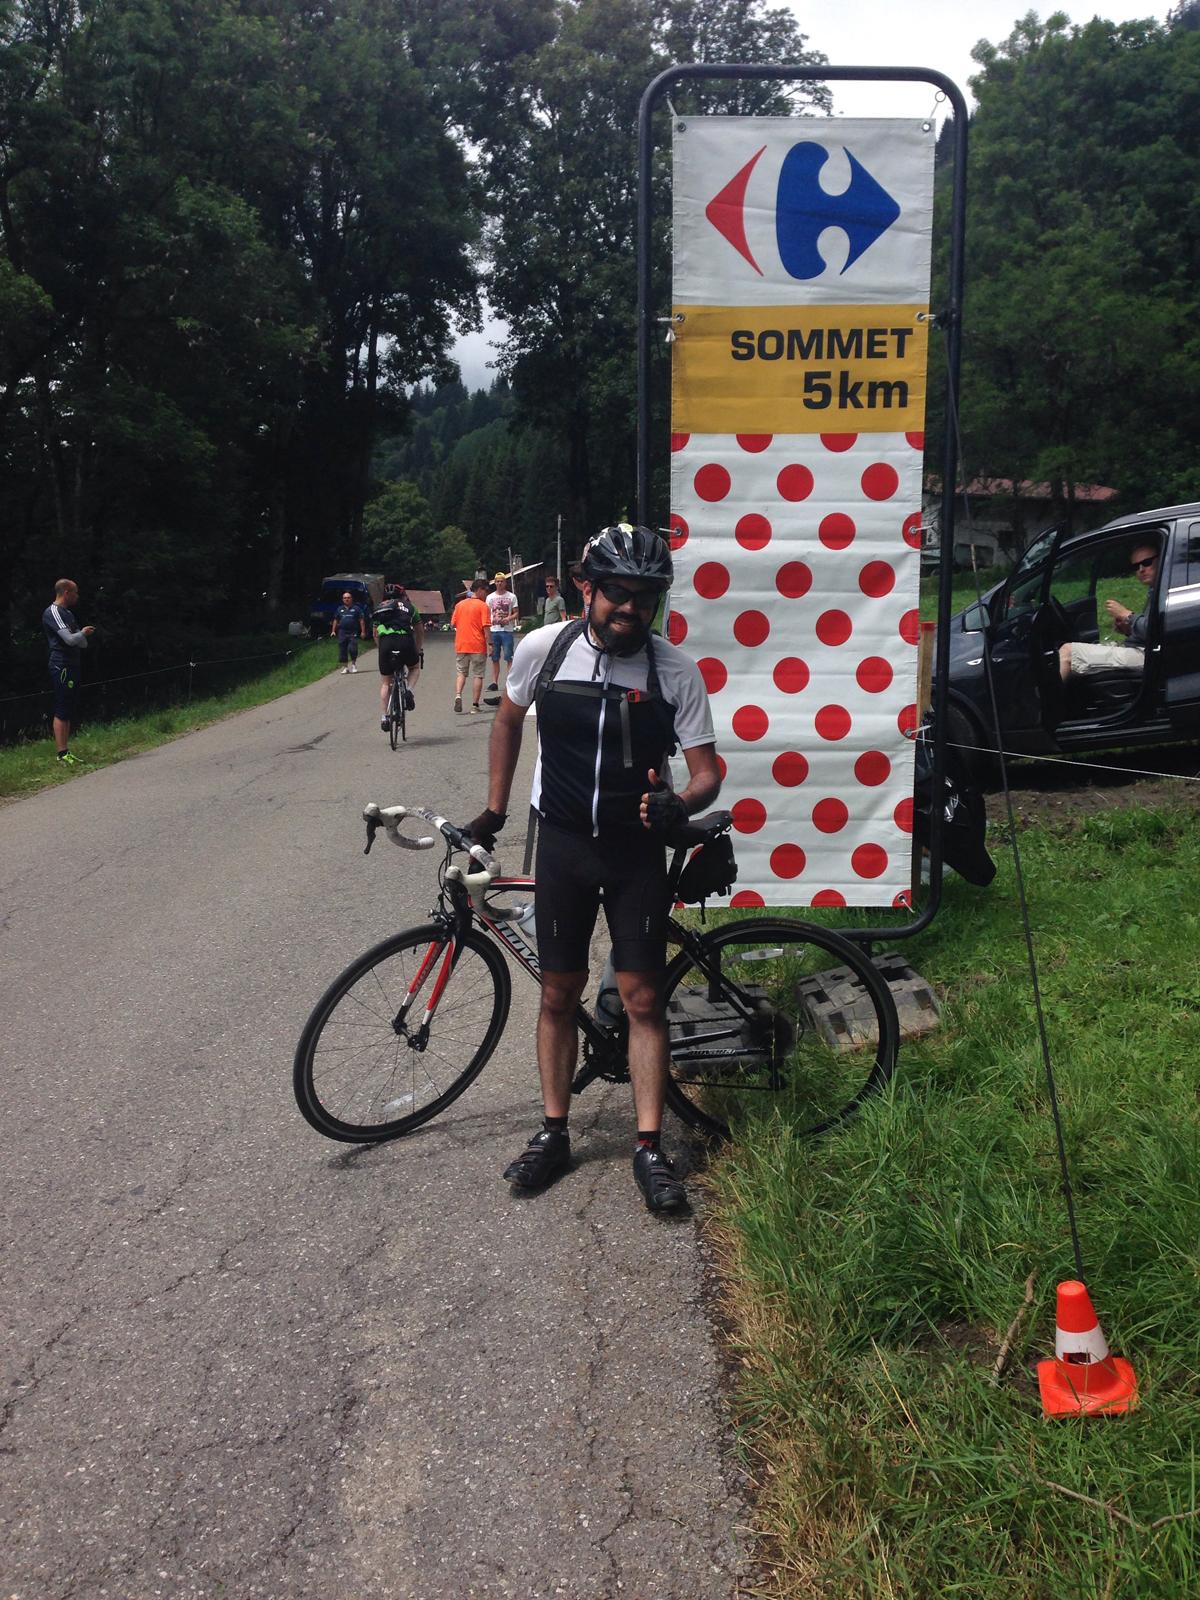 Enrique Arce-Larreta with 5 km to go to the top of the climb. Photo courtesy Enrique Arce-Larreta